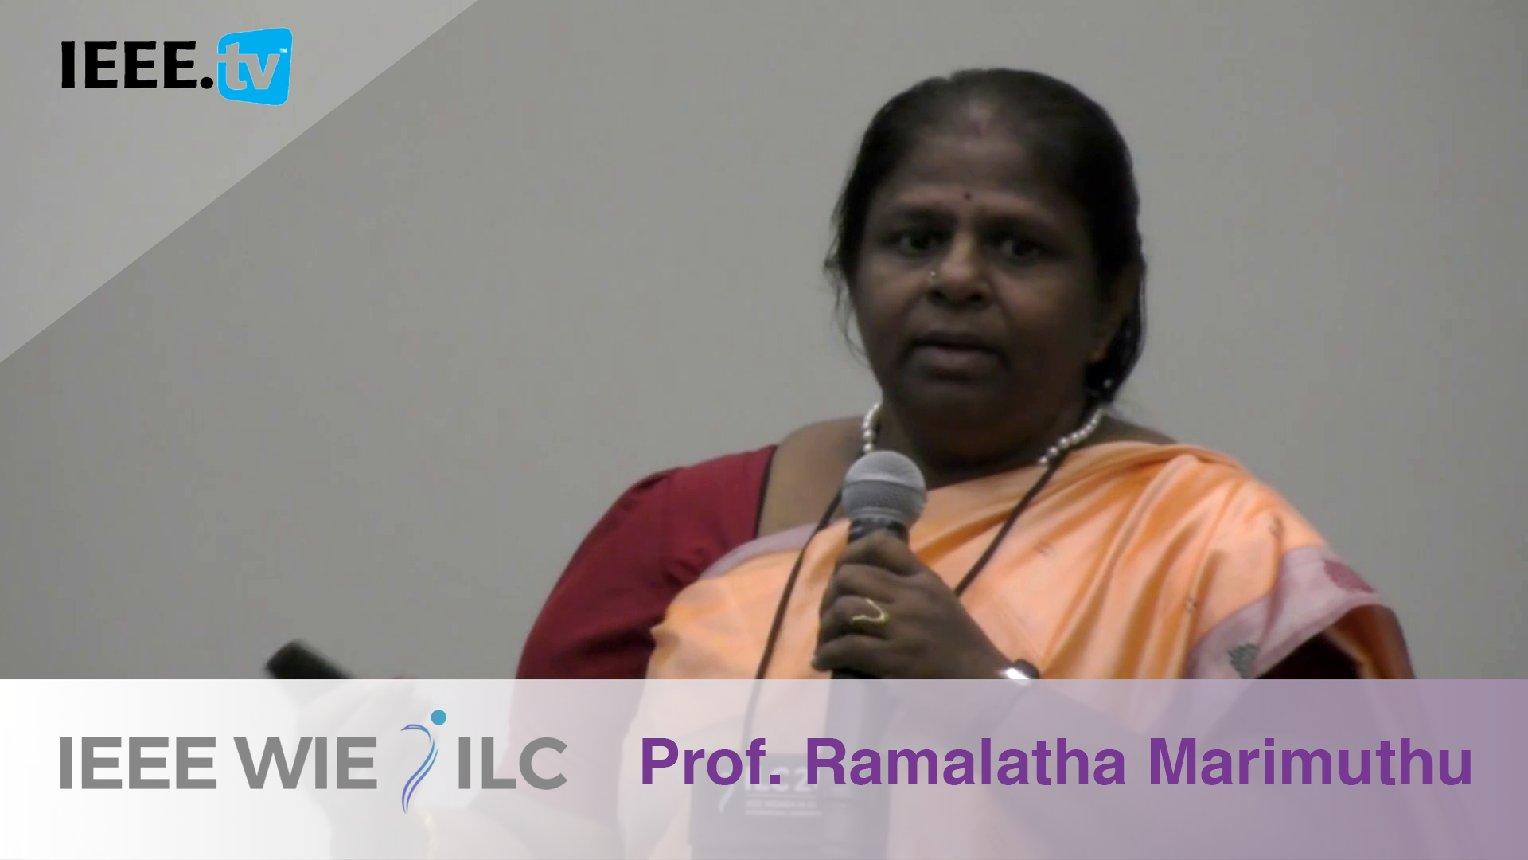 Ramalatha Marimuthu: Inspiring WIE Member of the Year Winner - IEEE WIE ILC Awards 2017